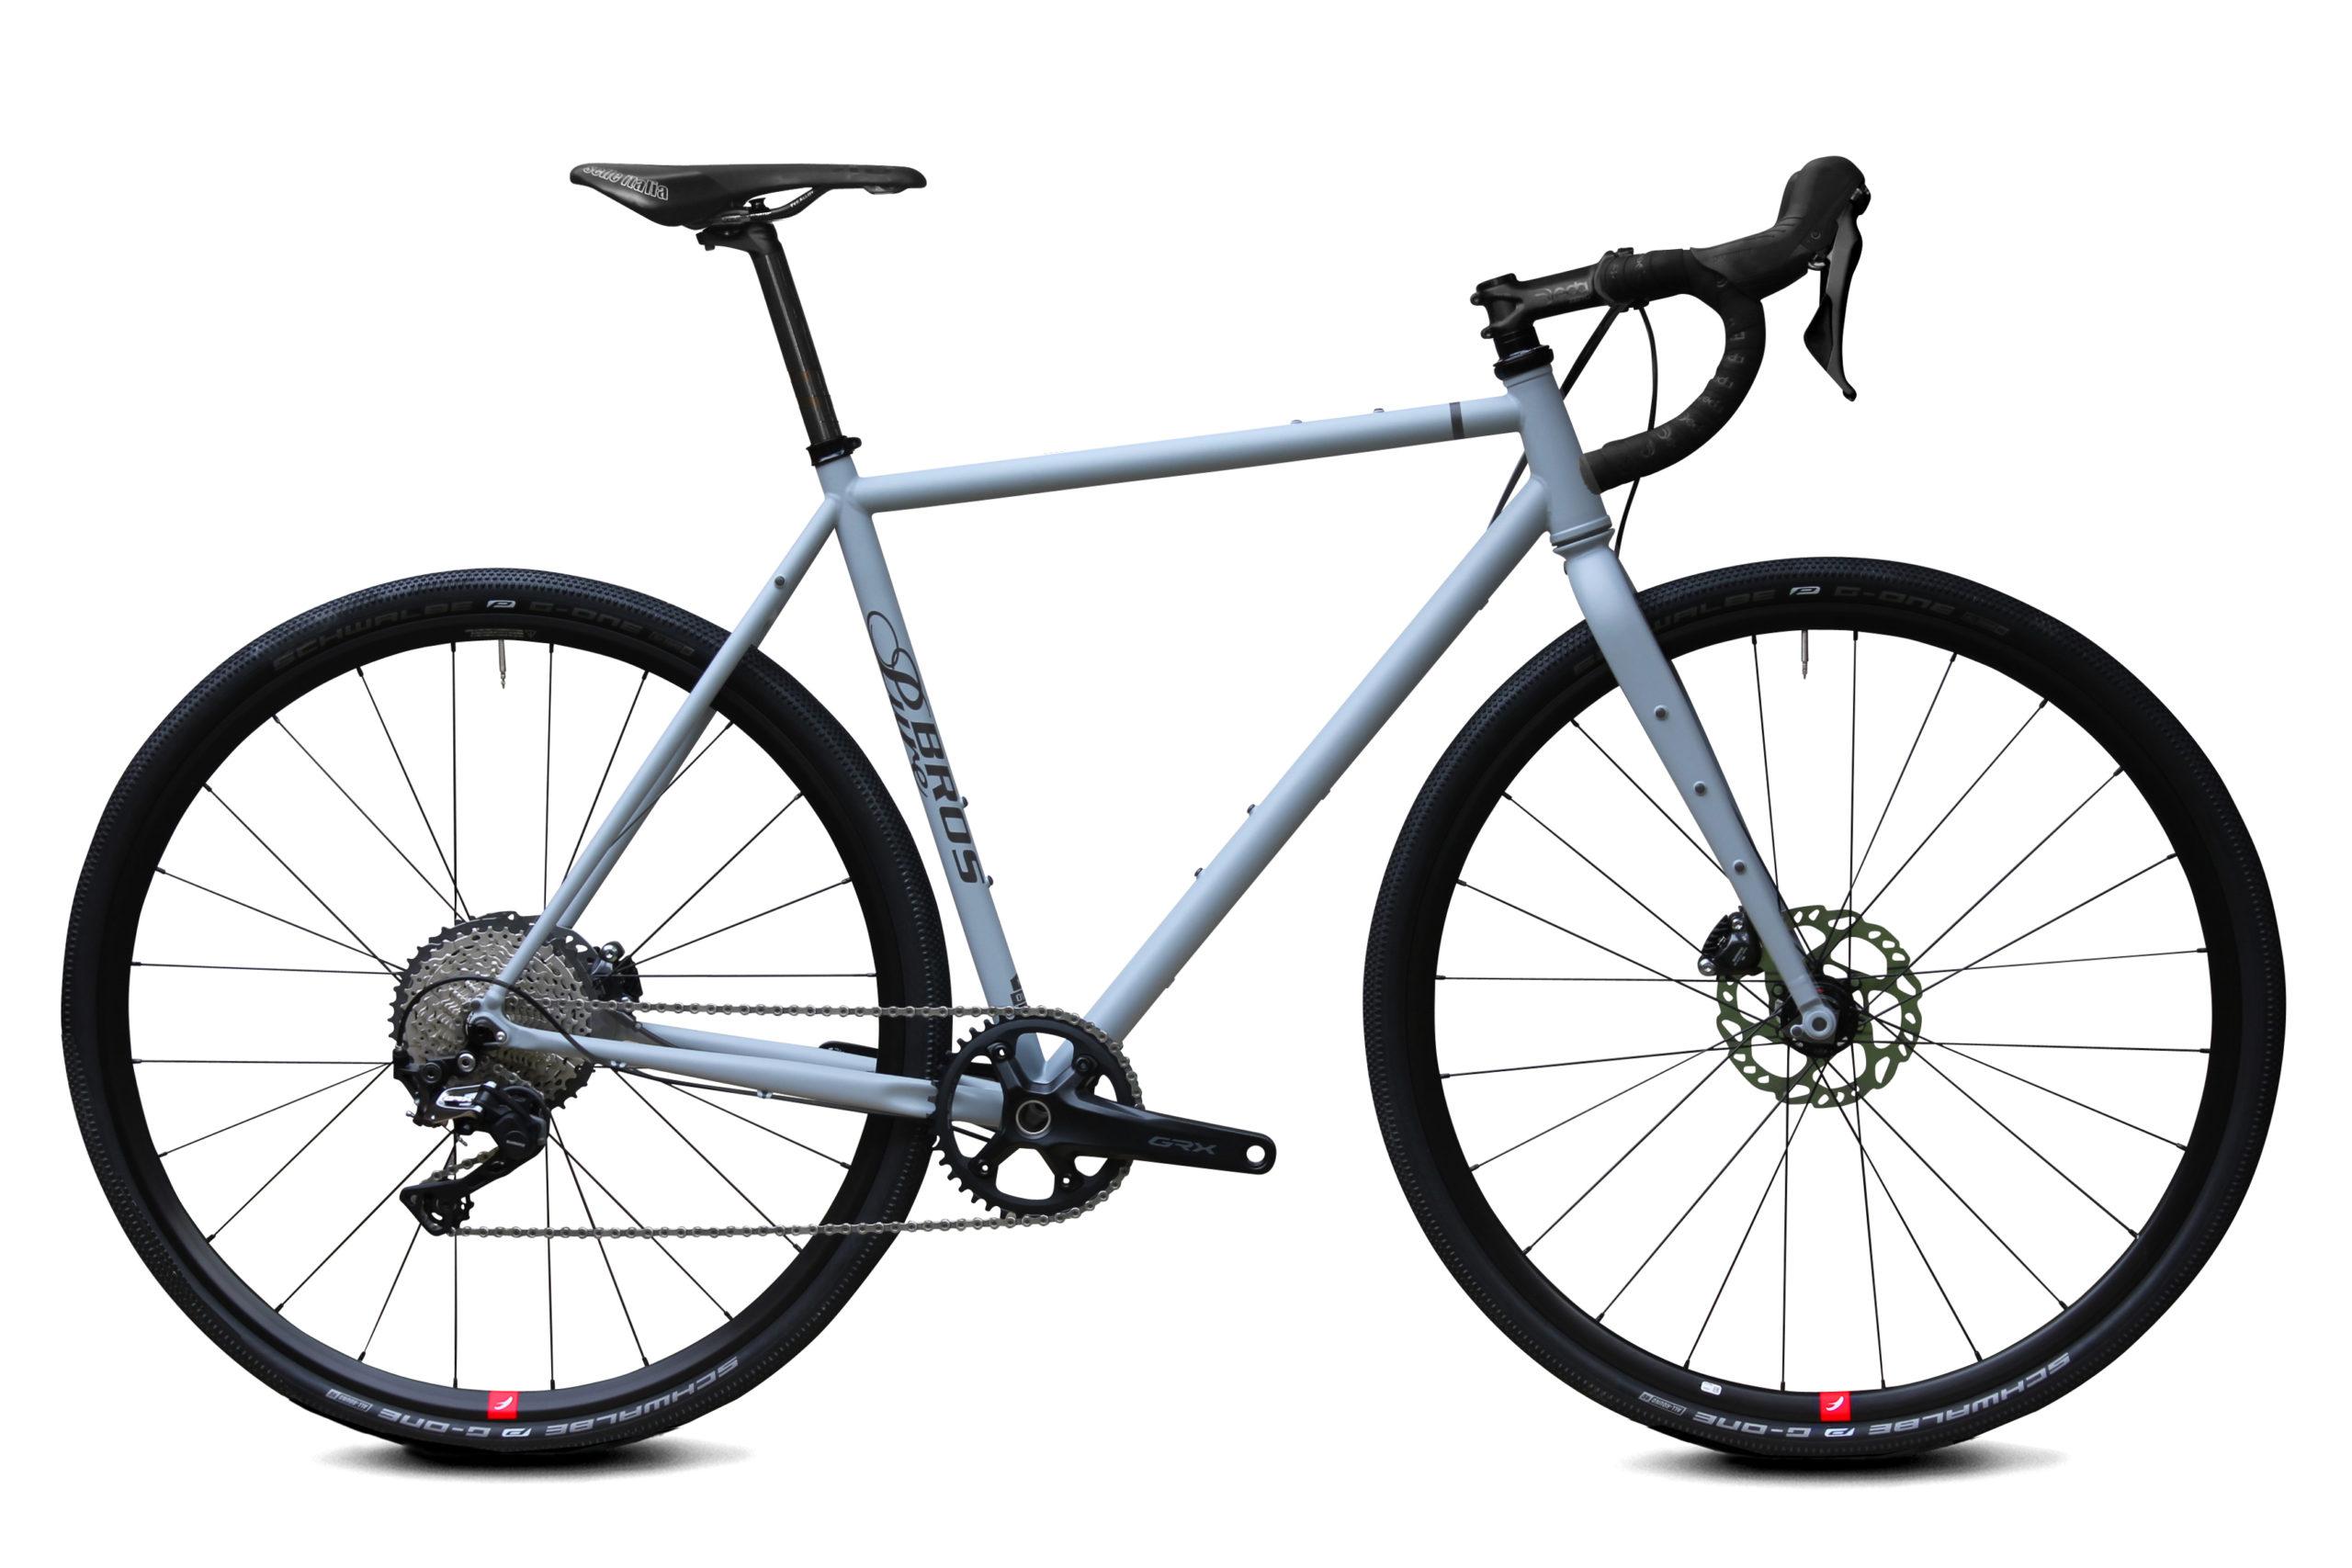 Stahlrahmen Gravel Bike Expedition